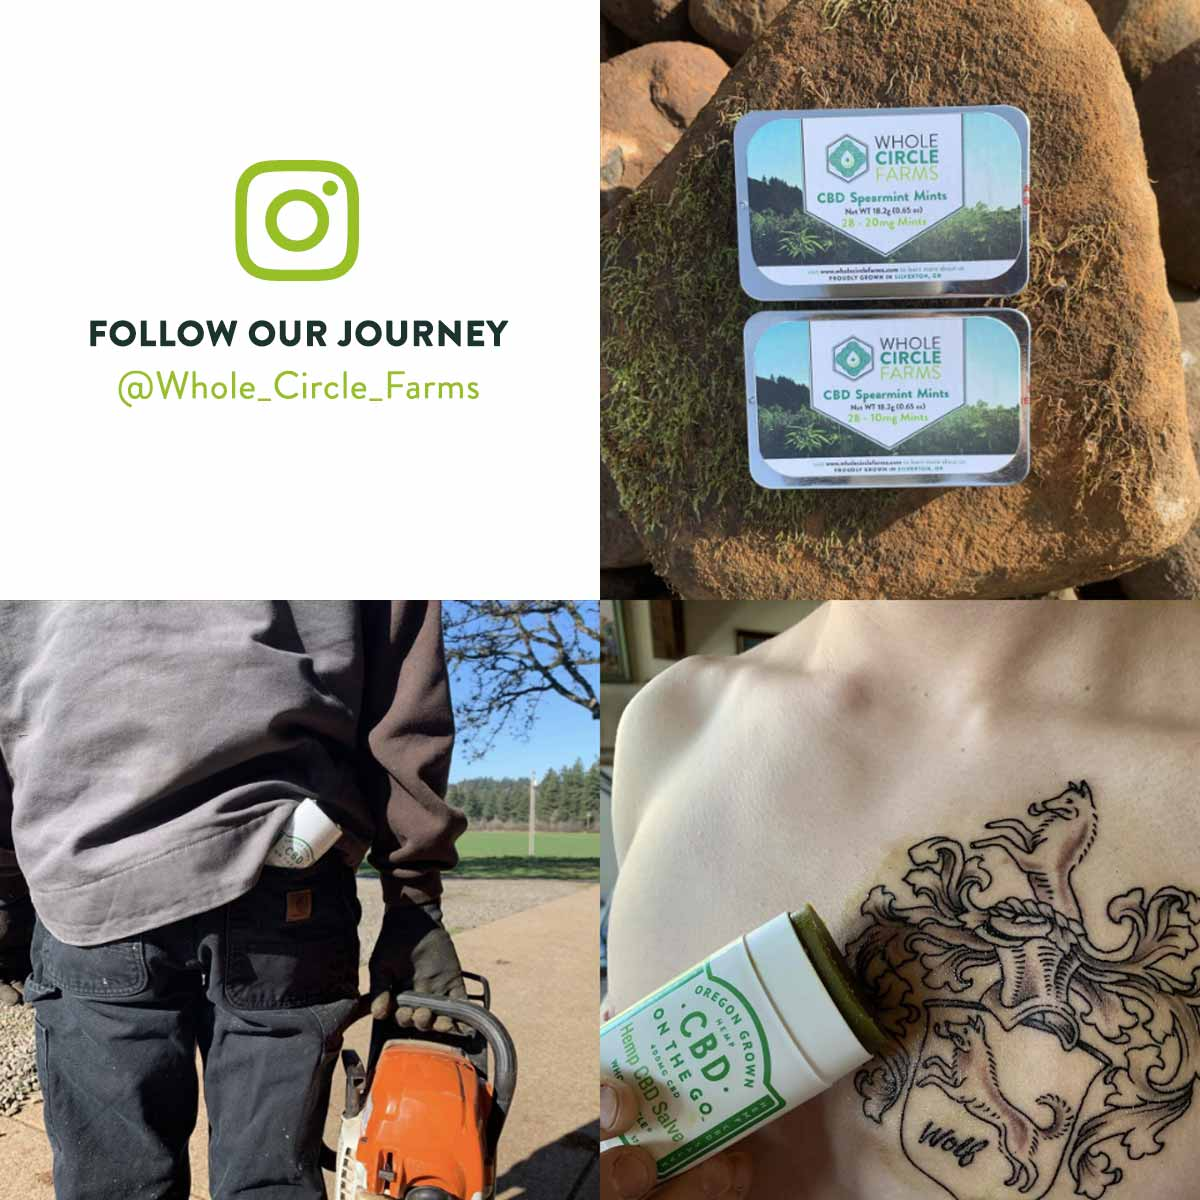 whole-circle-farms-instagram